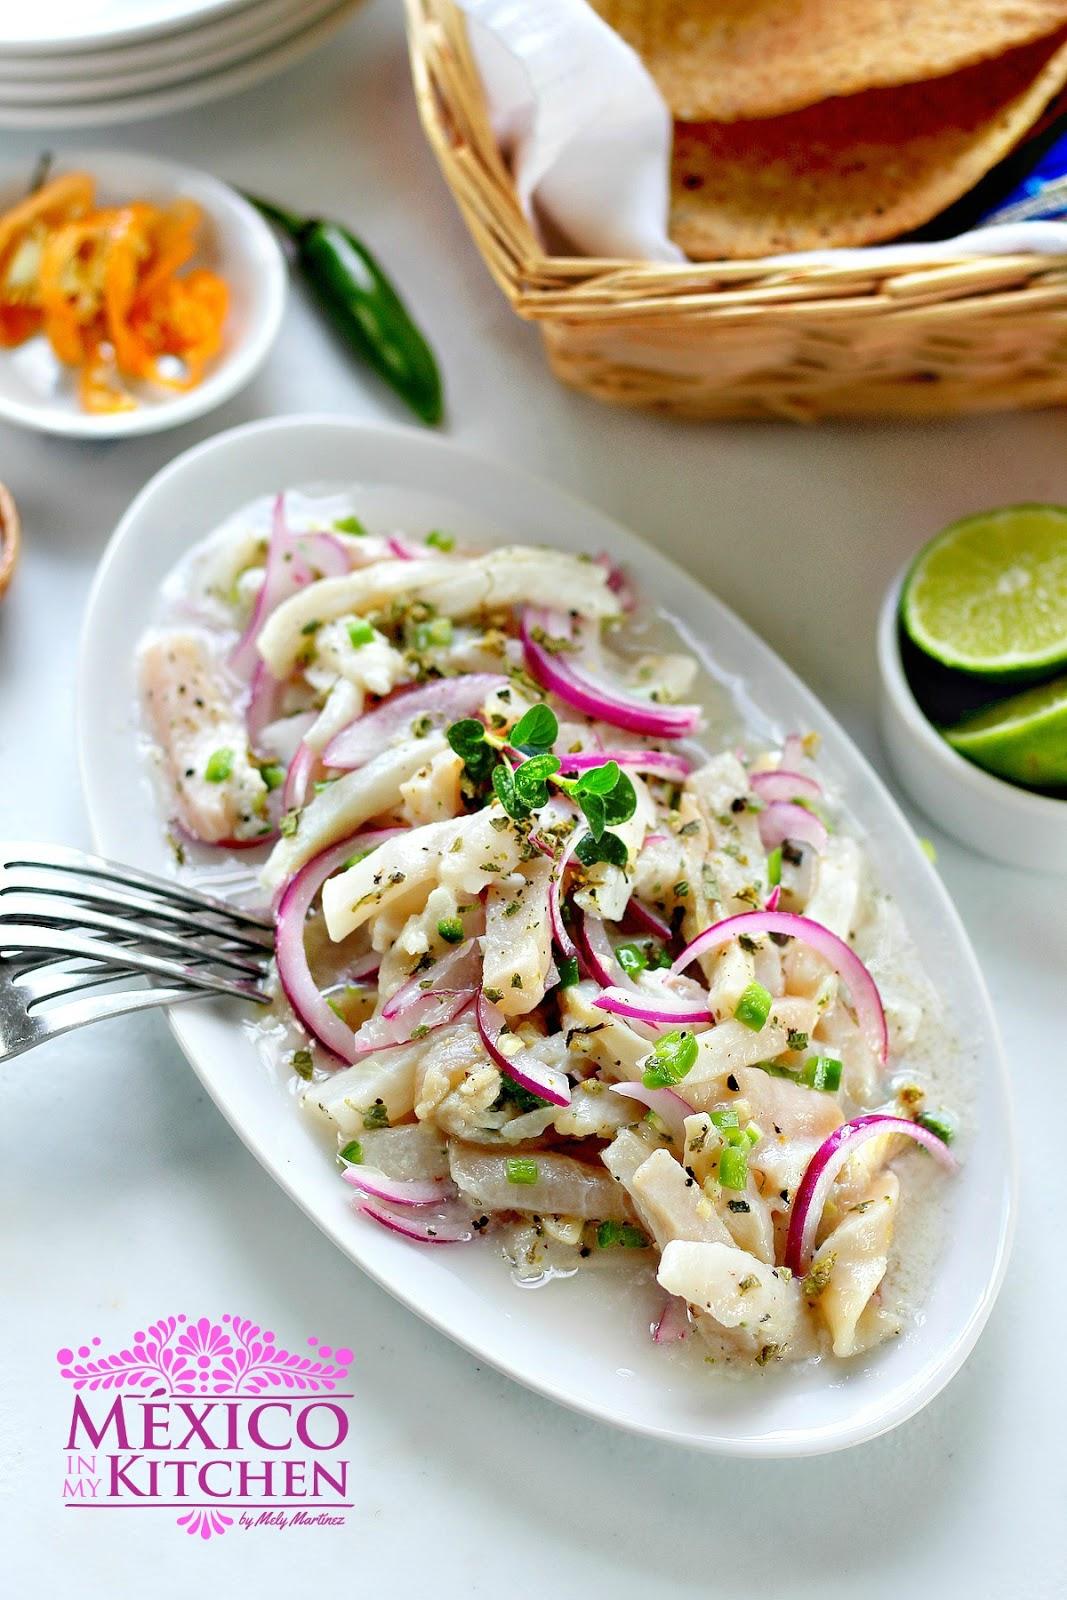 Tiritas De Pescado Zihuatanejo Style Traditional Homestyle Mexican Food Recipes Mexico In My